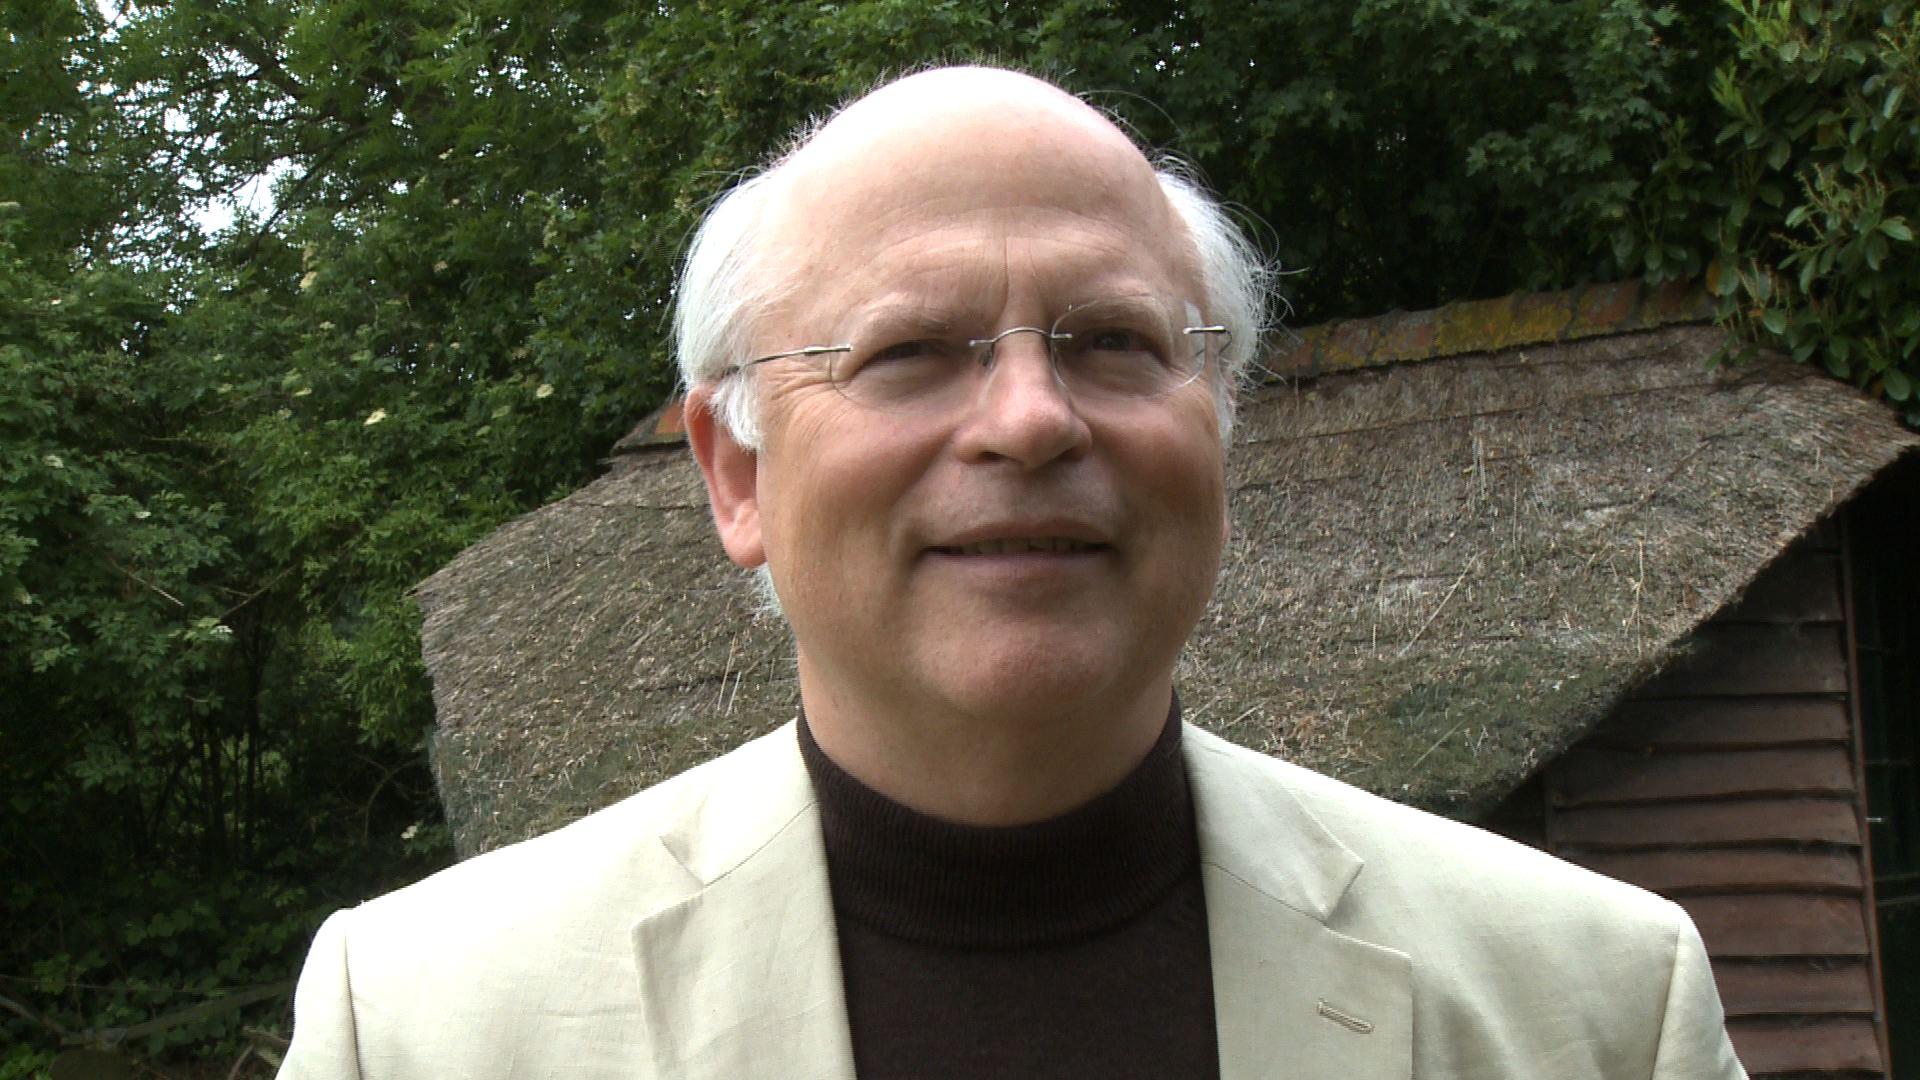 Arthur Zajonc on 'Insides for Change' 11-11-2012